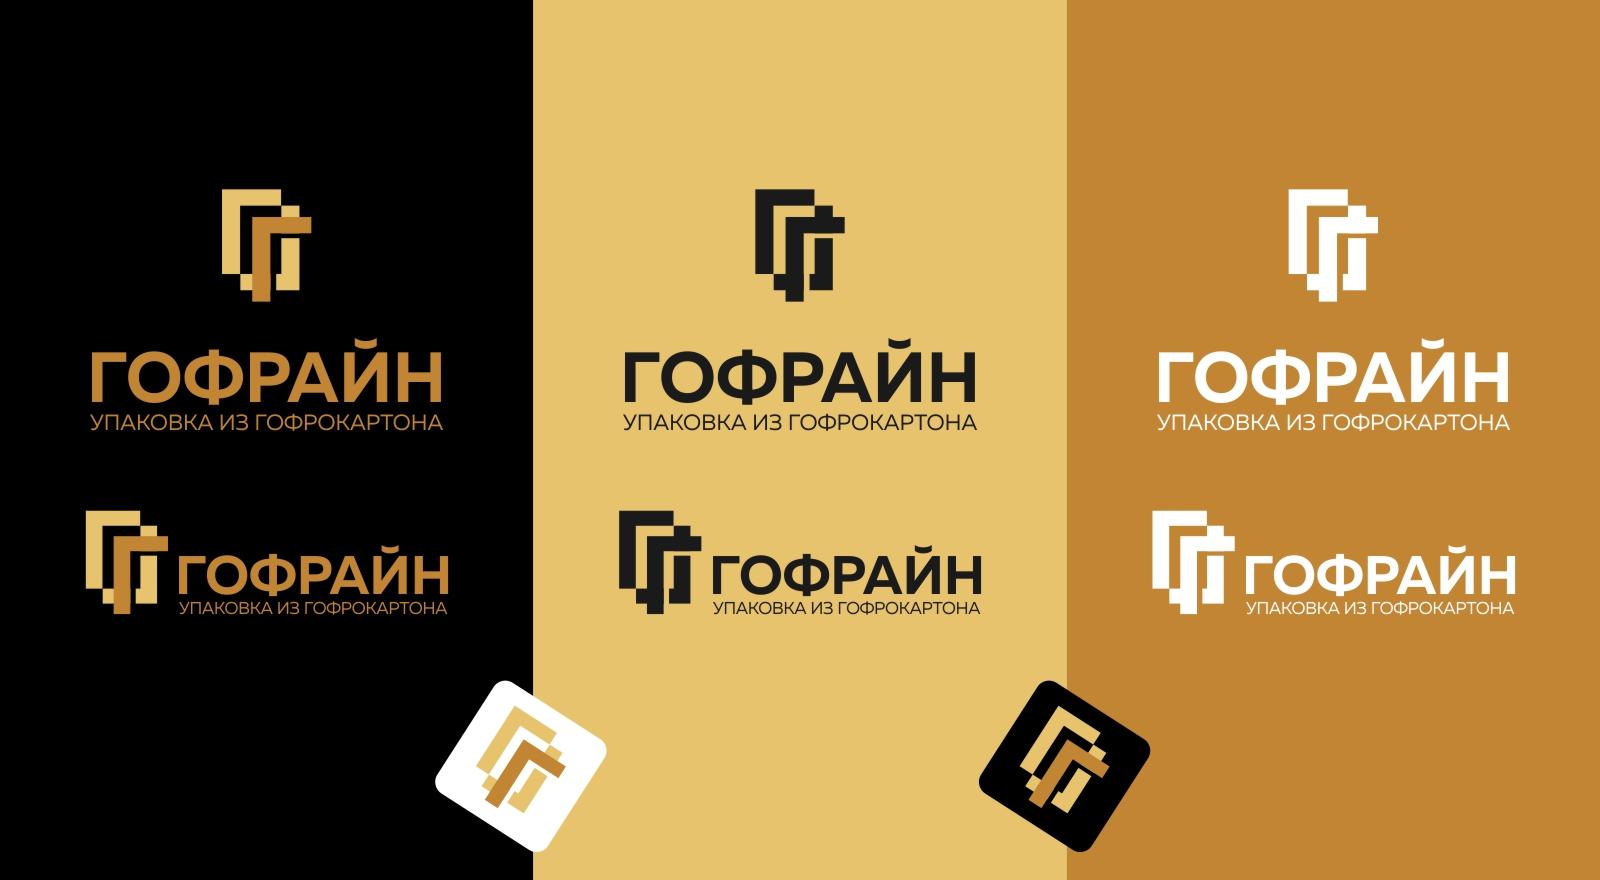 Логотип для компании по реализации упаковки из гофрокартона фото f_5145cdec71fce418.jpg